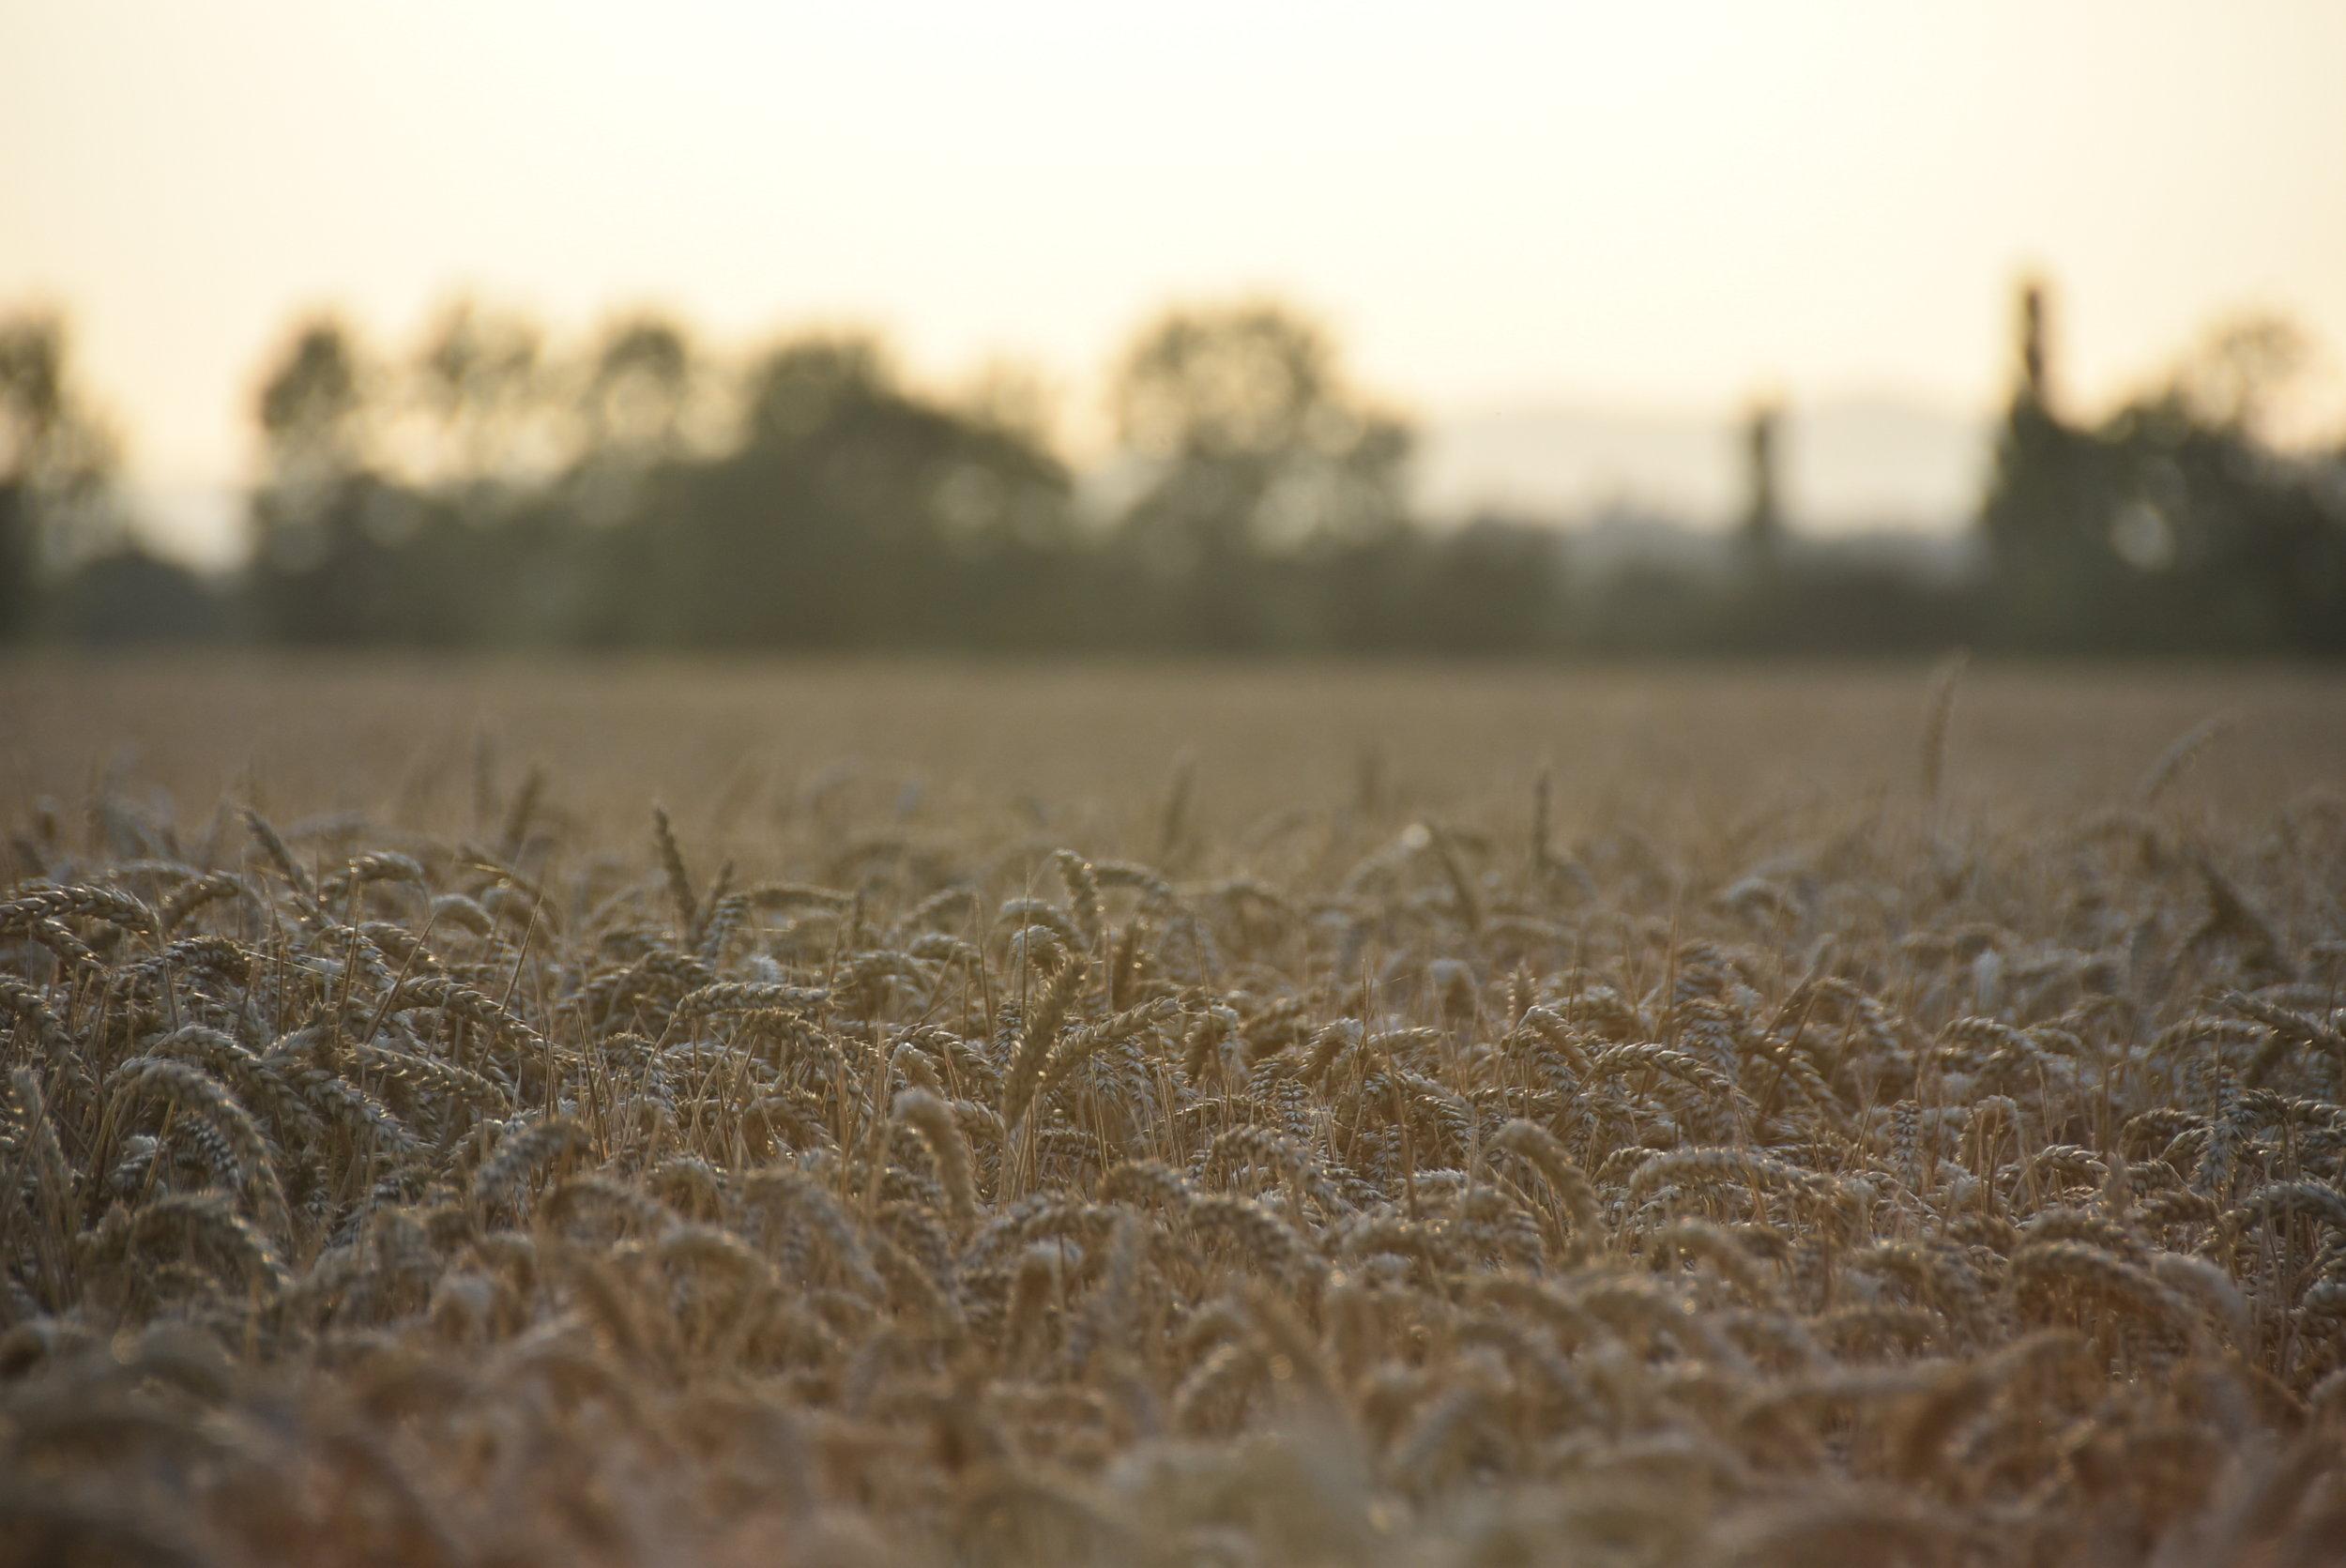 Summer - field of wheat